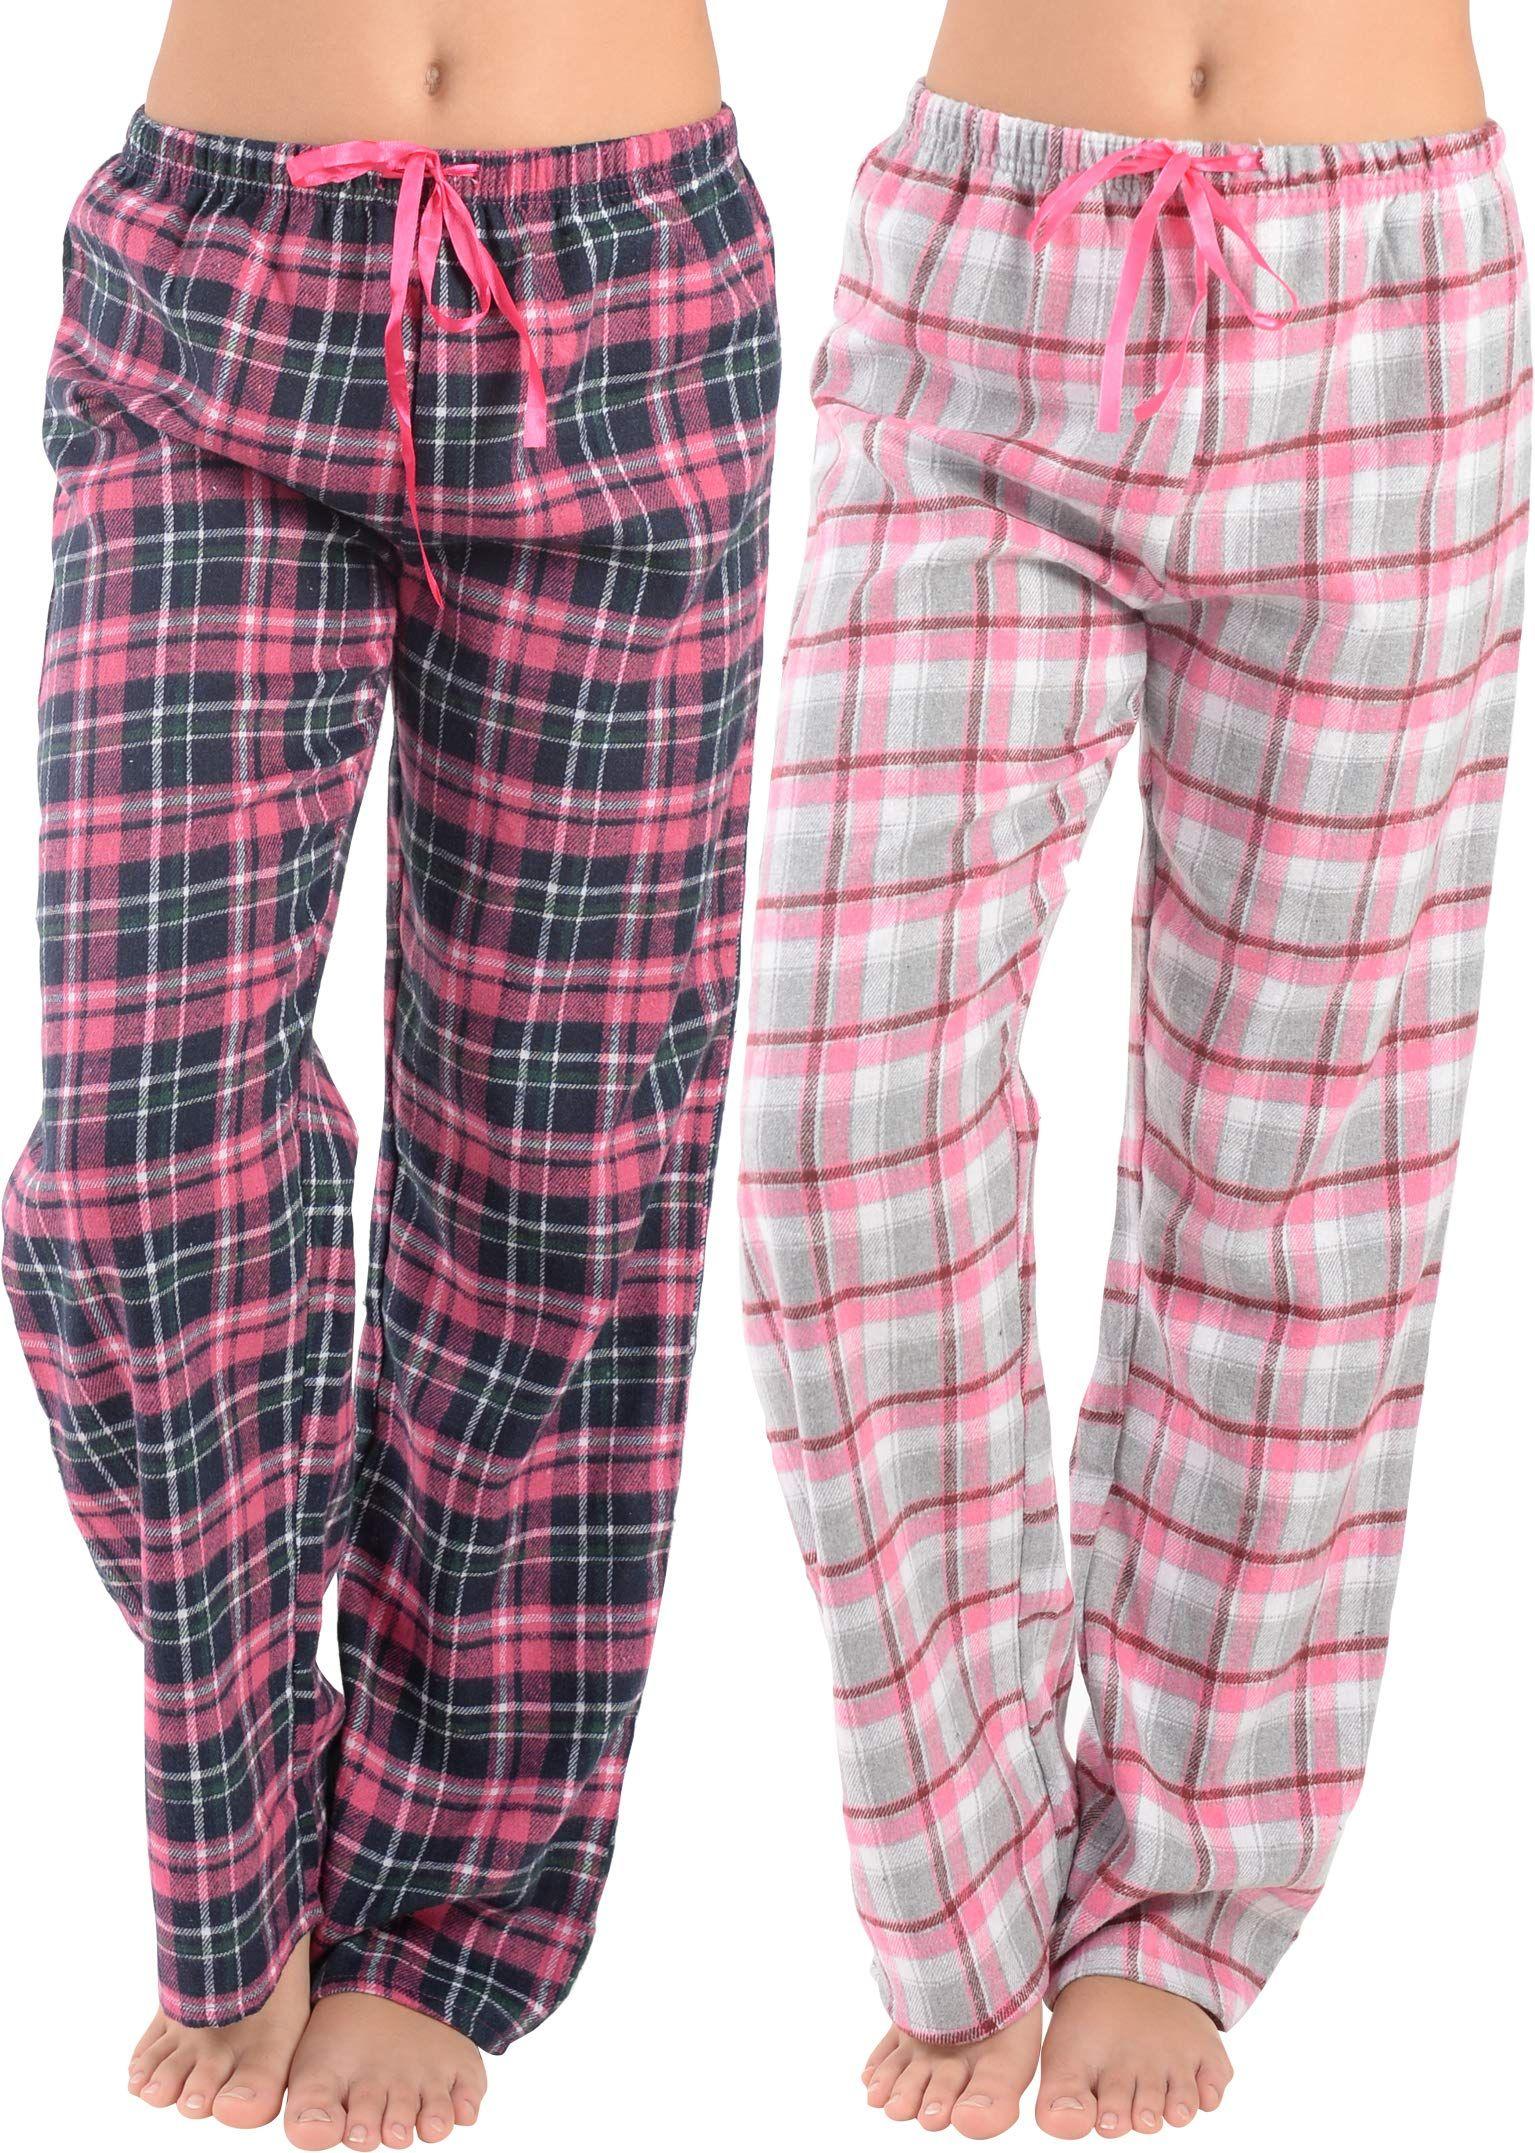 2 Pack Ladies Fleece Pyjamas Lounge Pants Womens Bottoms Trousers Pjs Nightwear